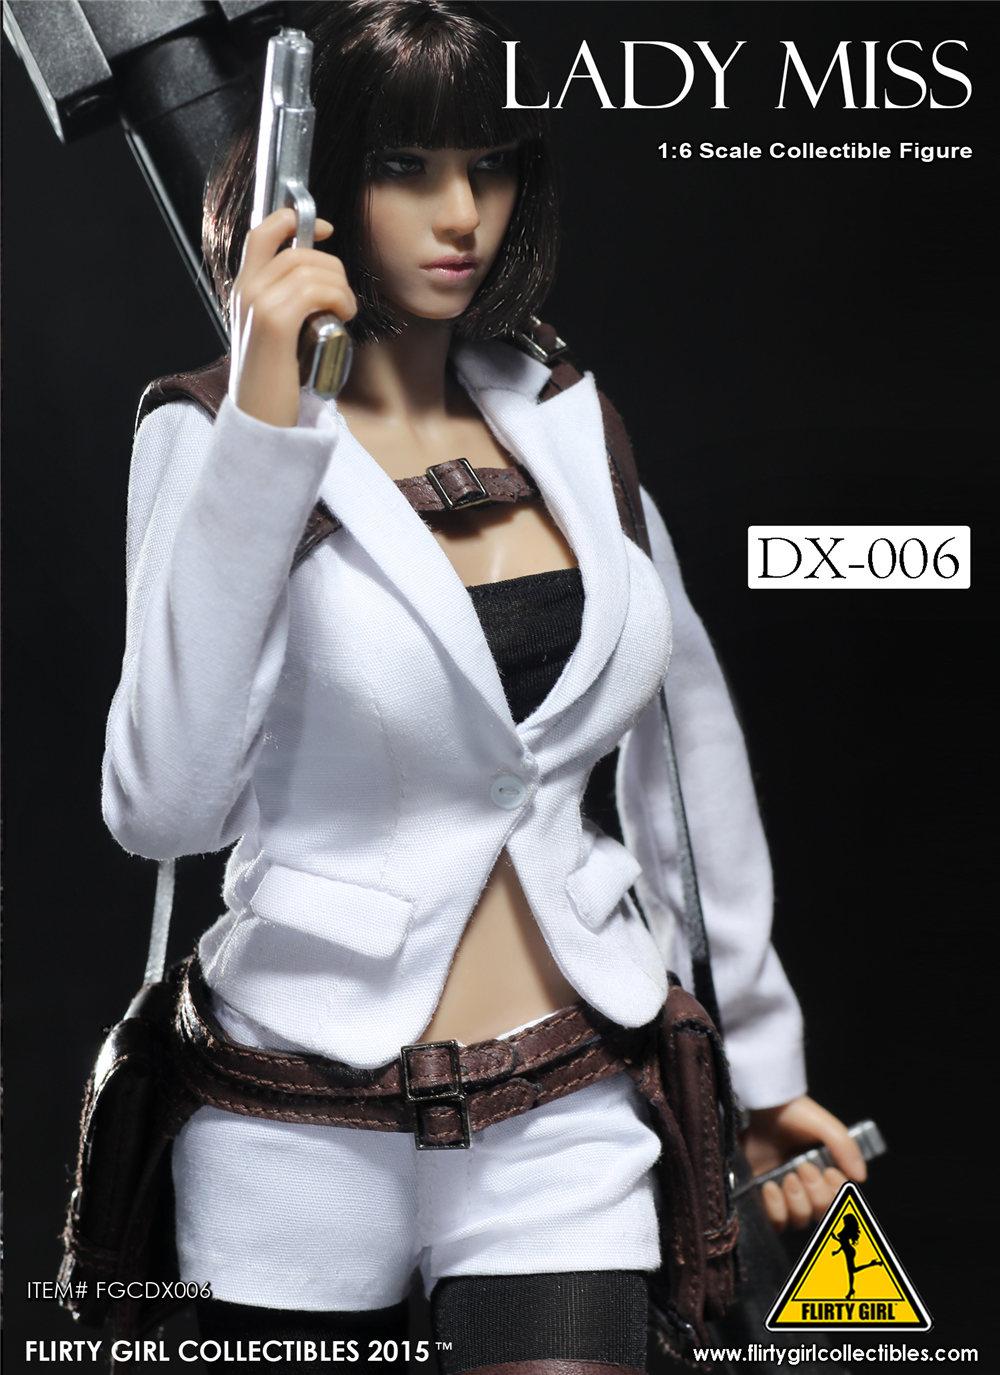 http://1.bp.blogspot.com/-3BboGyQidis/VXP2Kc-mXQI/AAAAAAAAjP4/0DGQ33JxuYU/s1640/f7.jpg